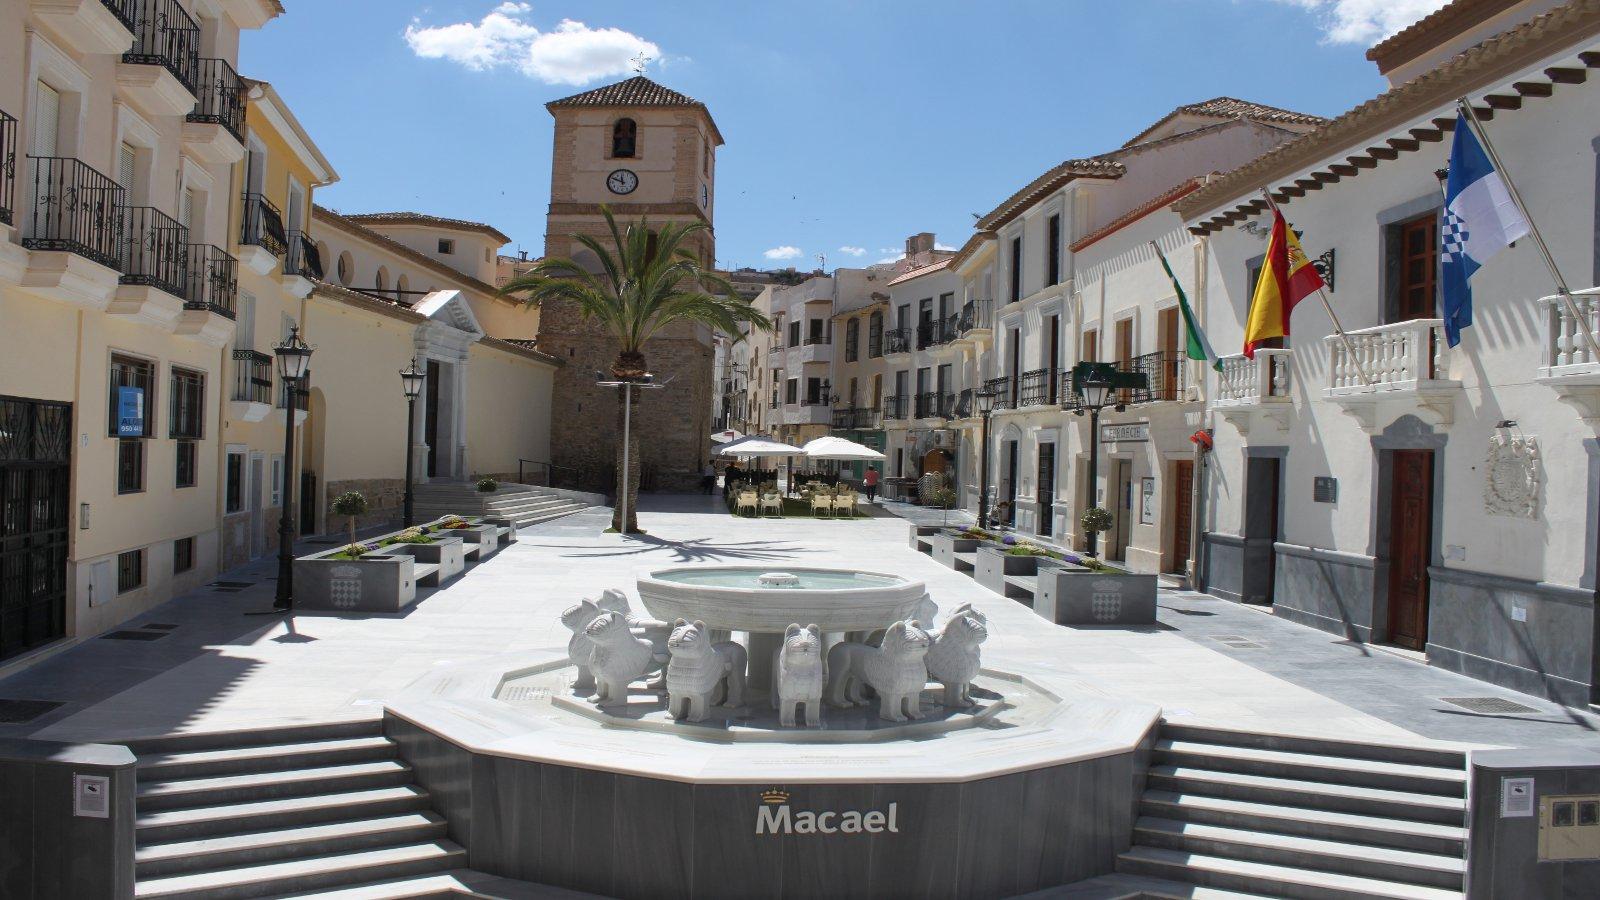 Macael marble clipart #2